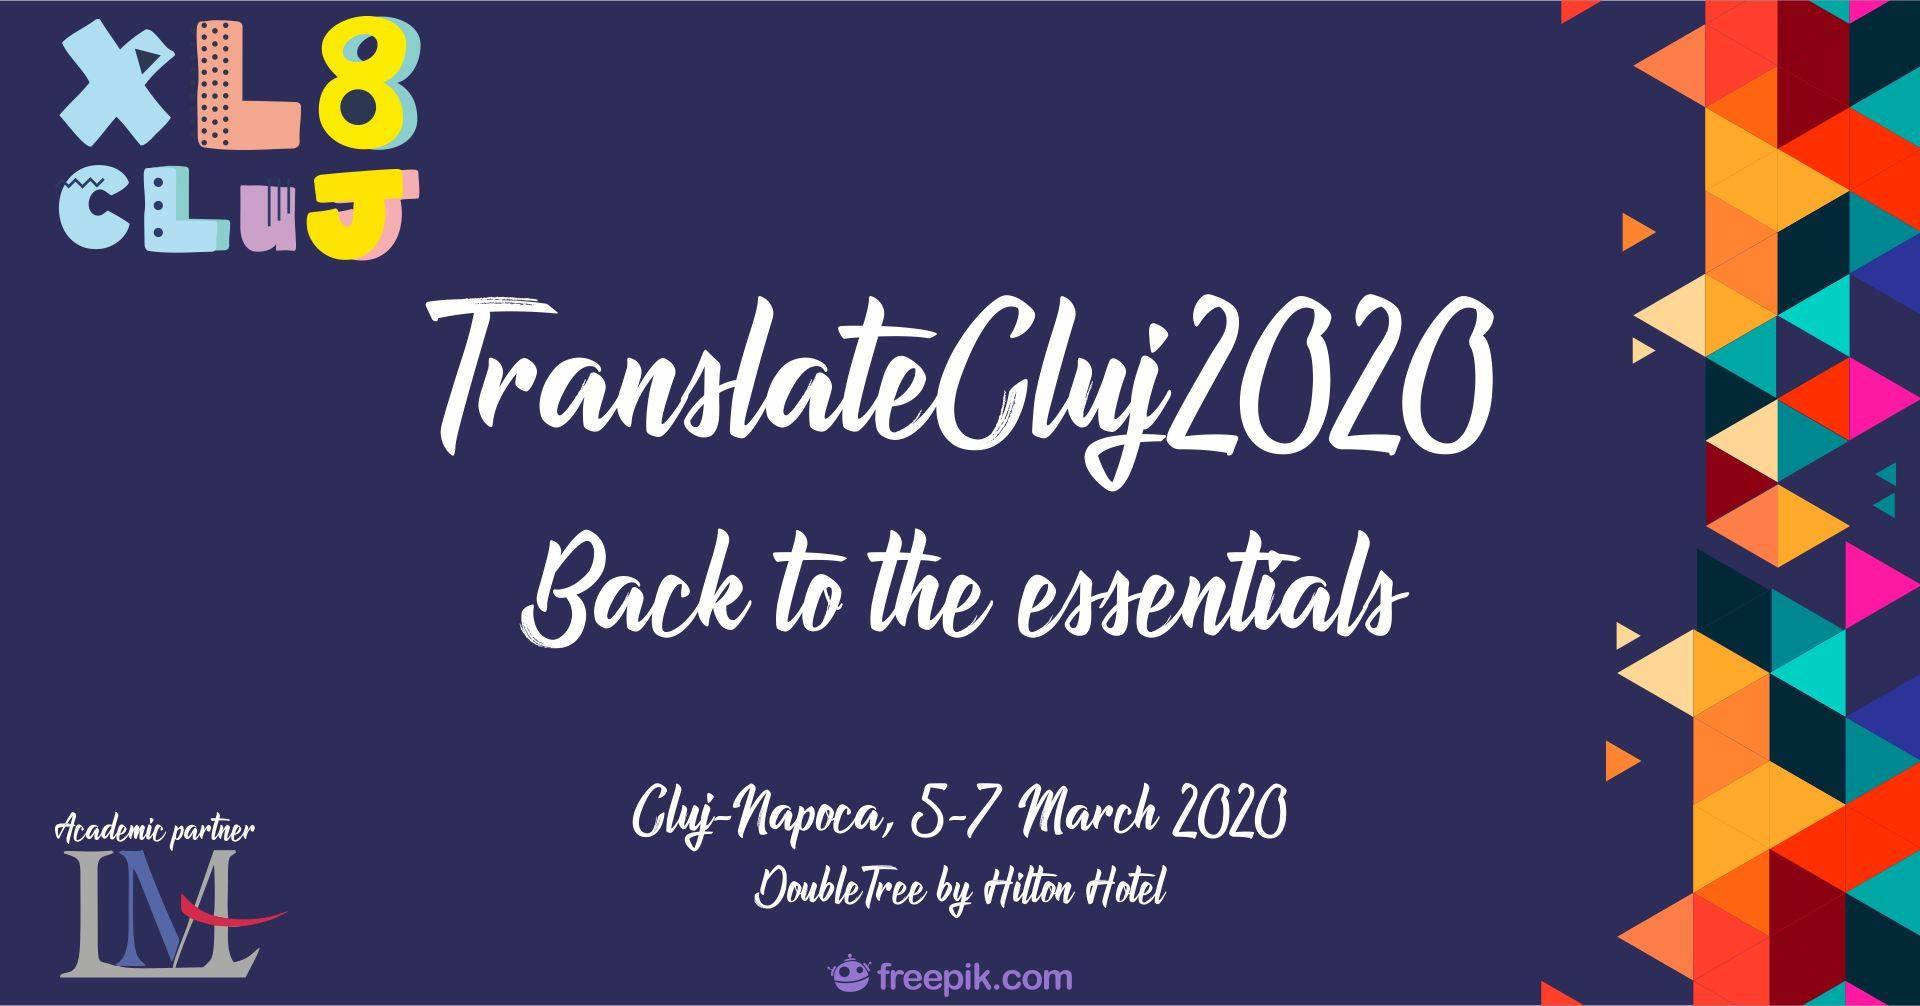 TranslateCluj 2020